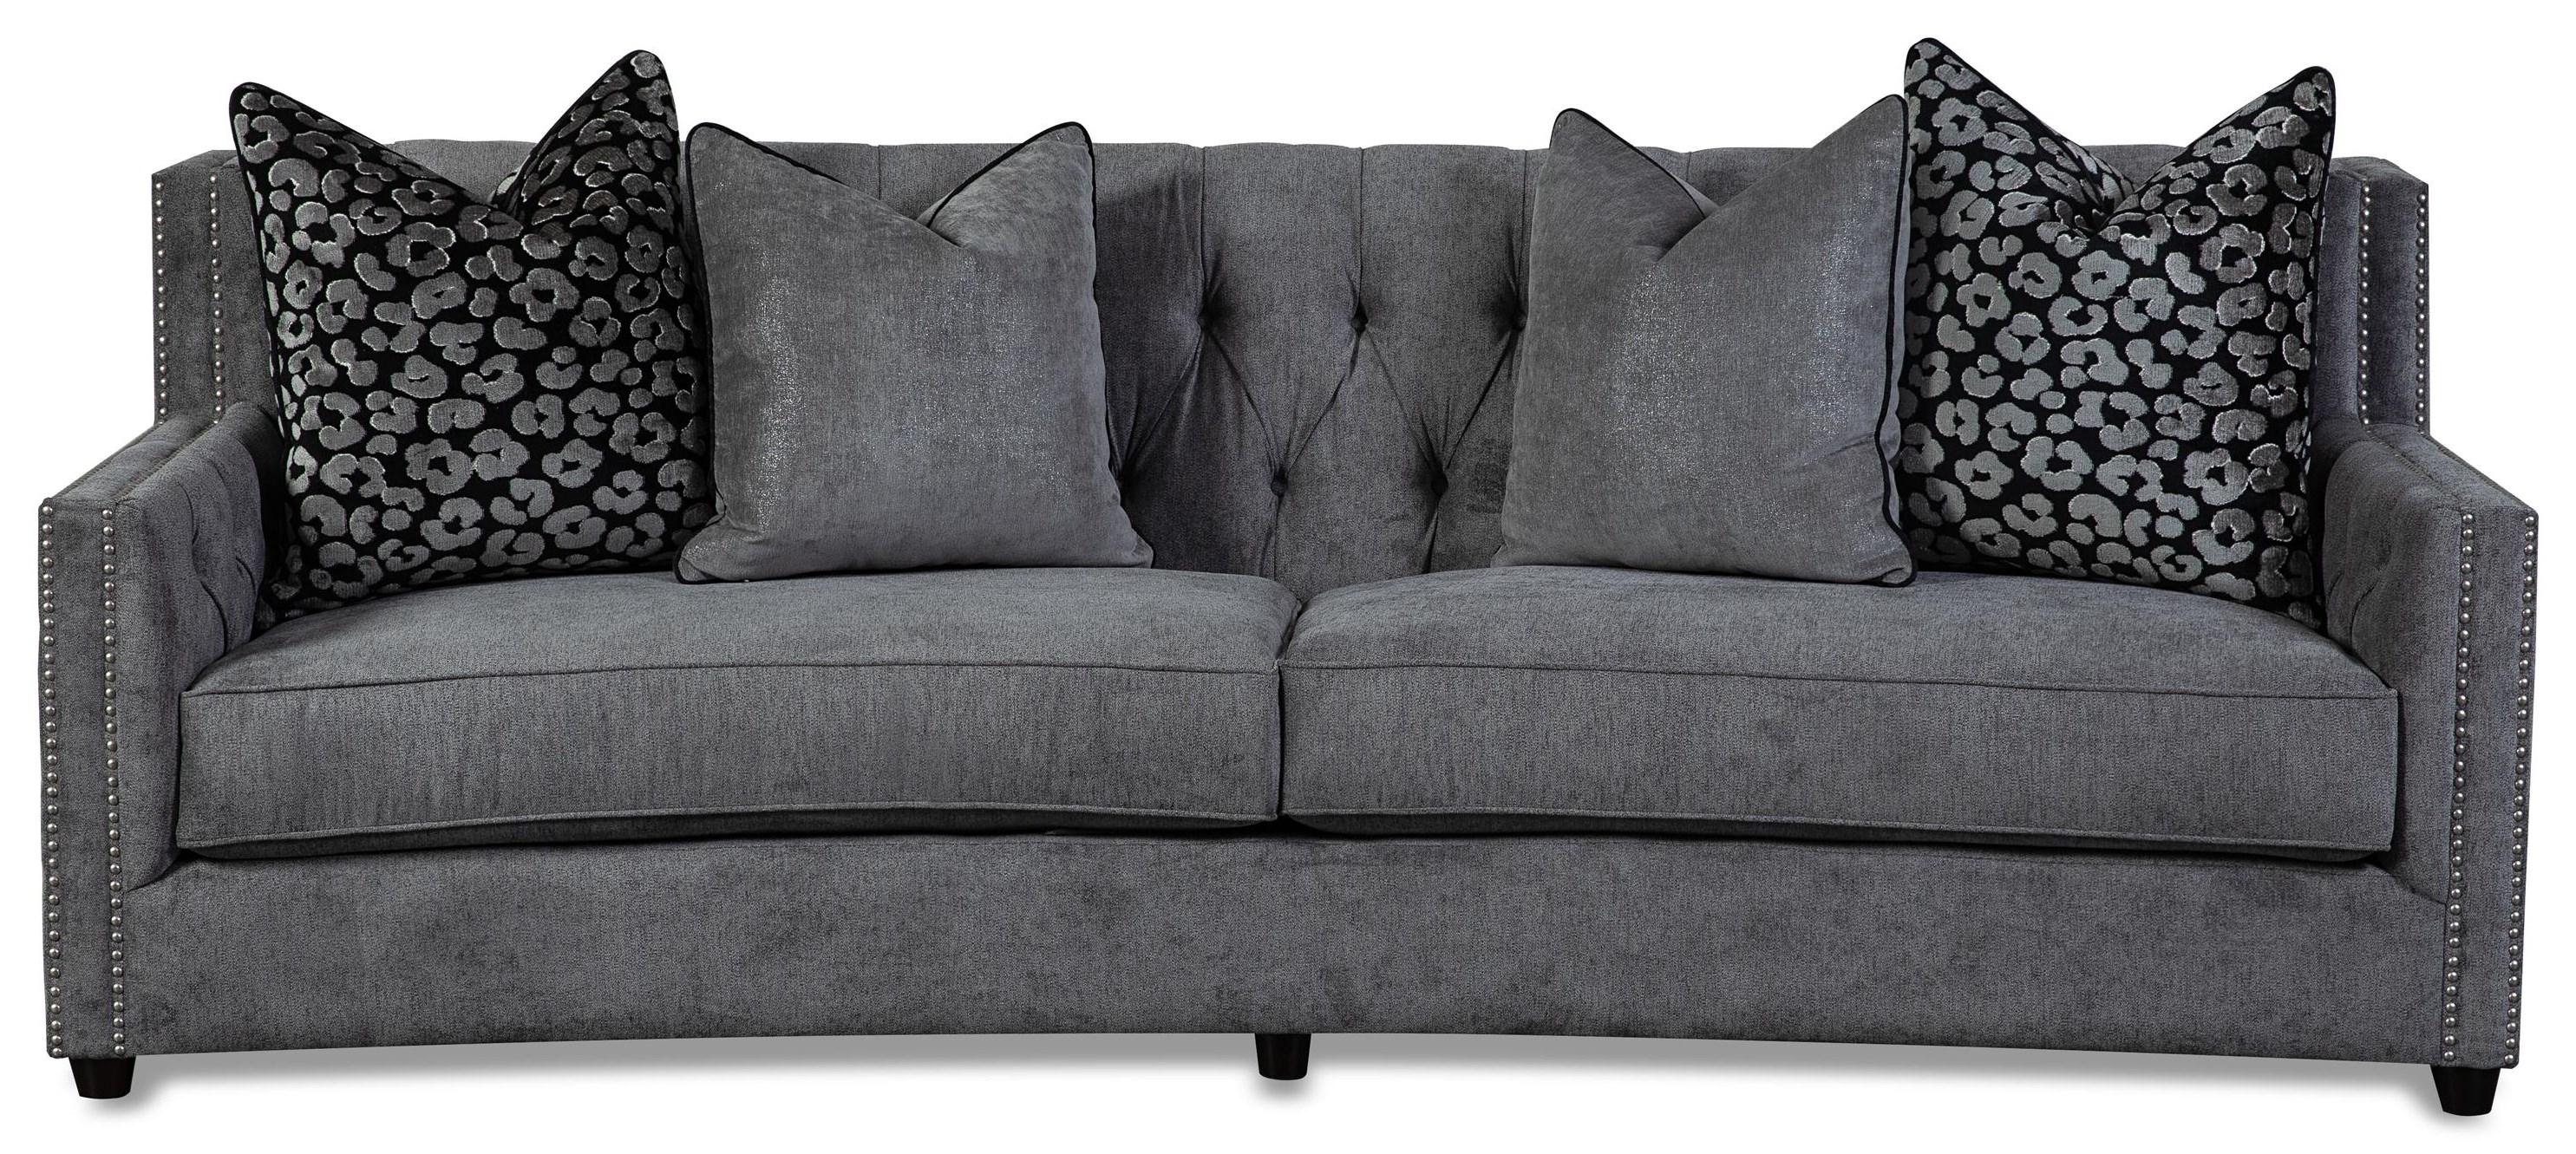 Rialto Rialto Sofa by Aria Designs at Morris Home